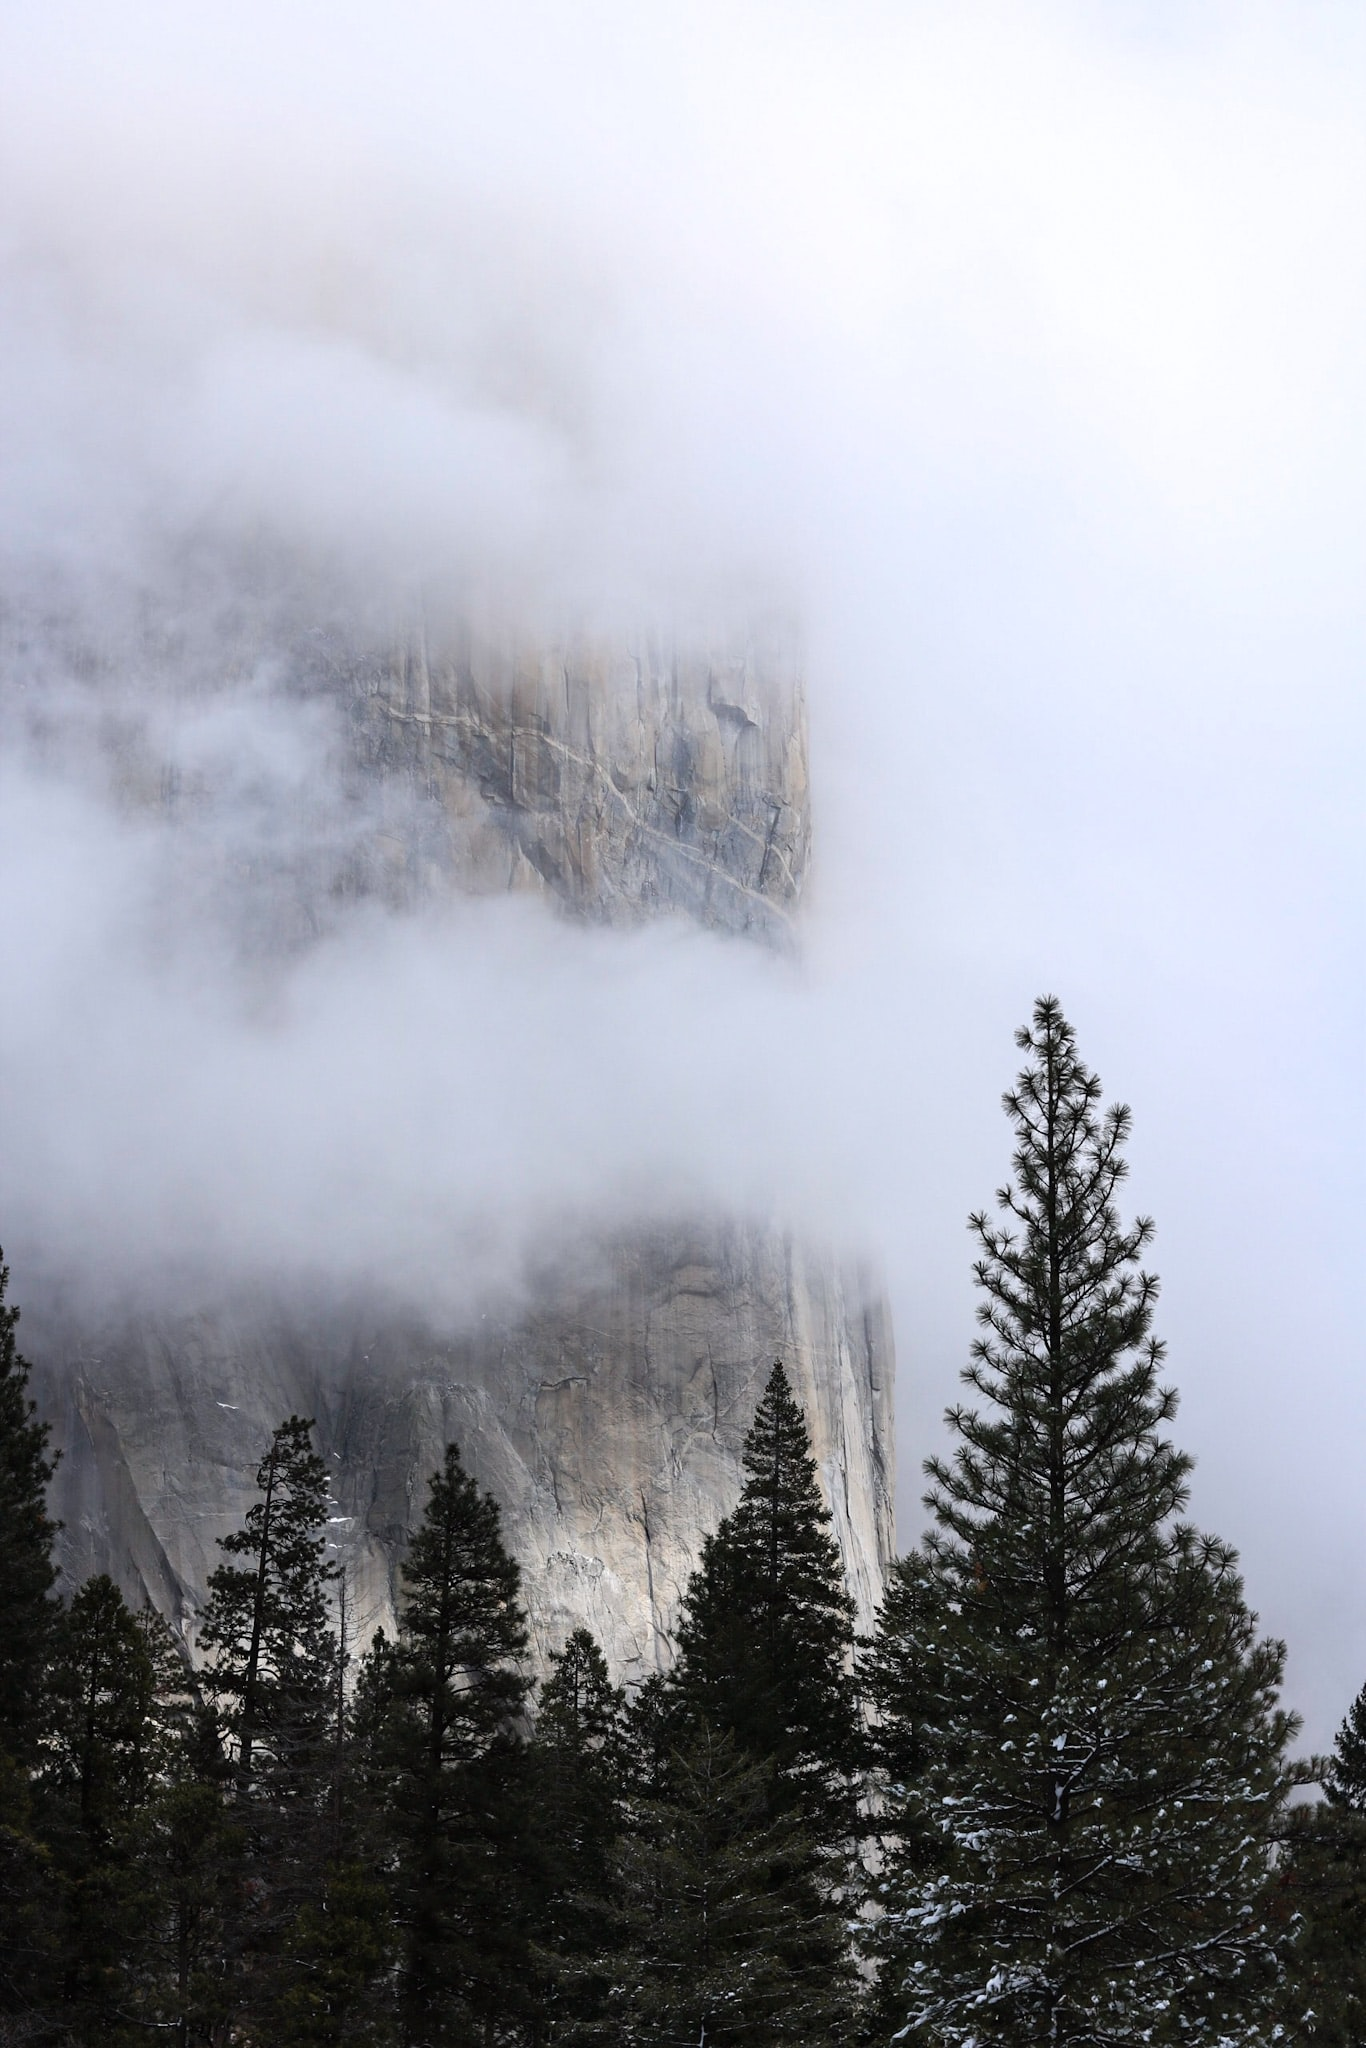 A steep cliff shrouded in fog in Yosemite